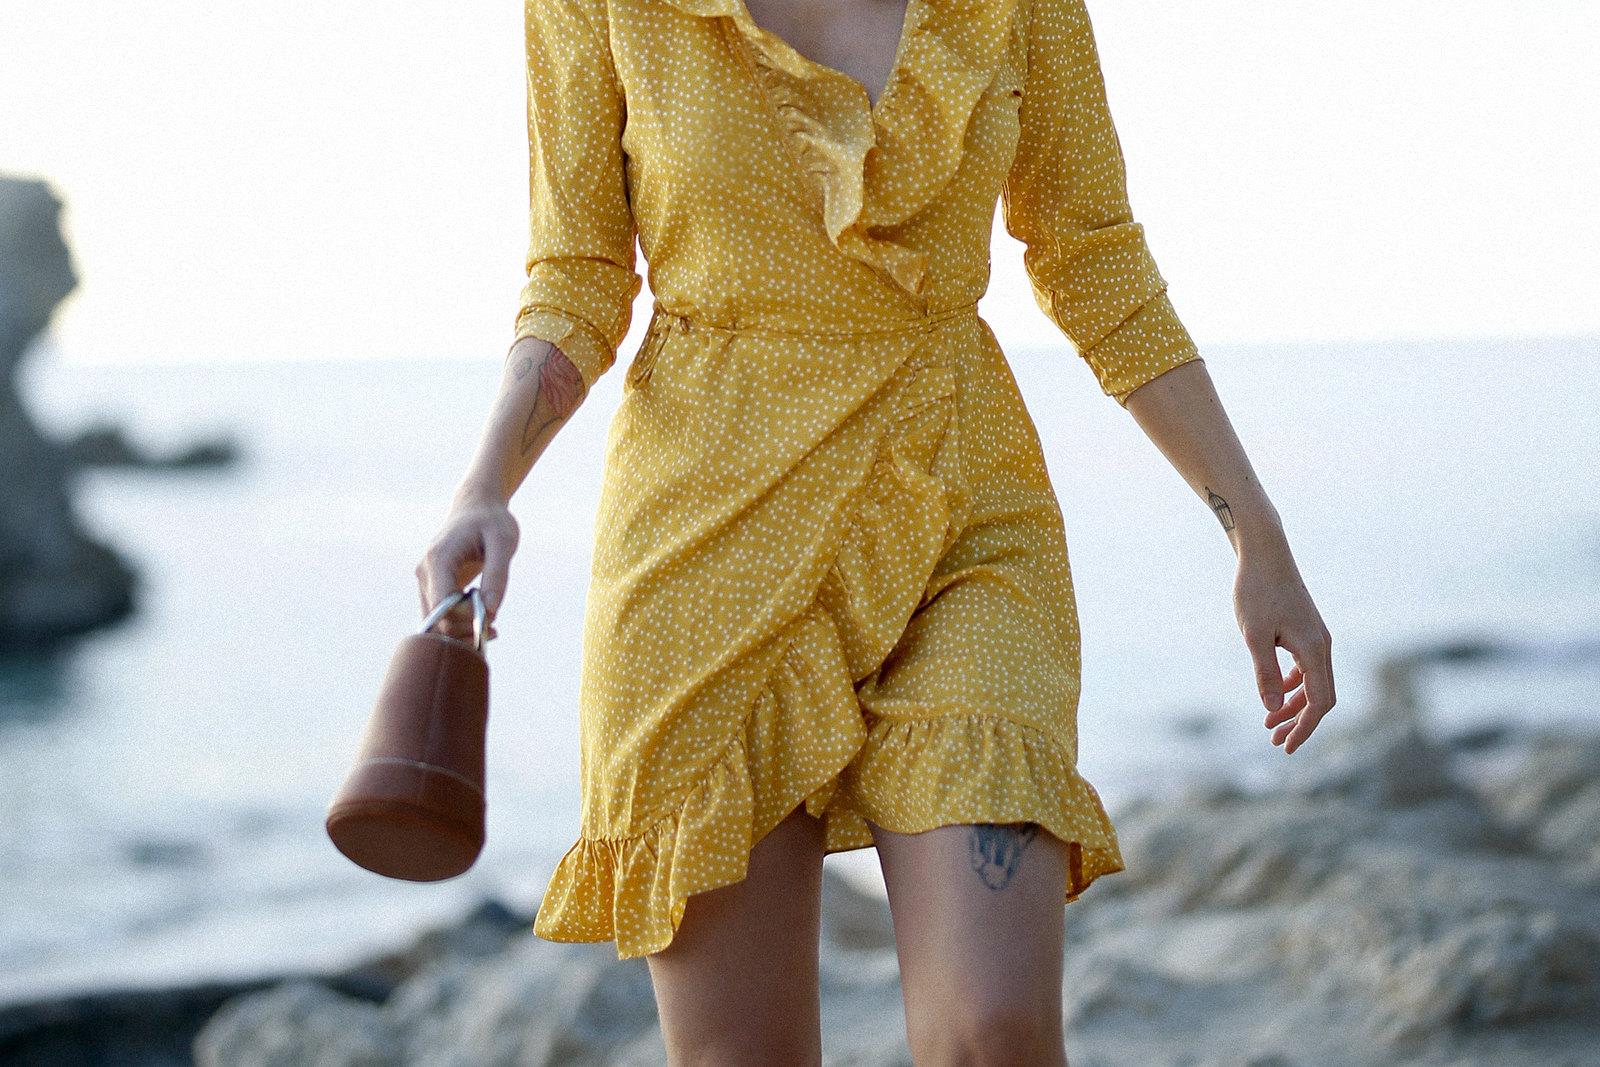 vila yellow mustard polka dot dress mallorca holiday beach sunrise moody style fashionblogger cats & dogs modeblog ricarda schernus fotograf max bechmann düsseldorf travelbloggers roamers 3